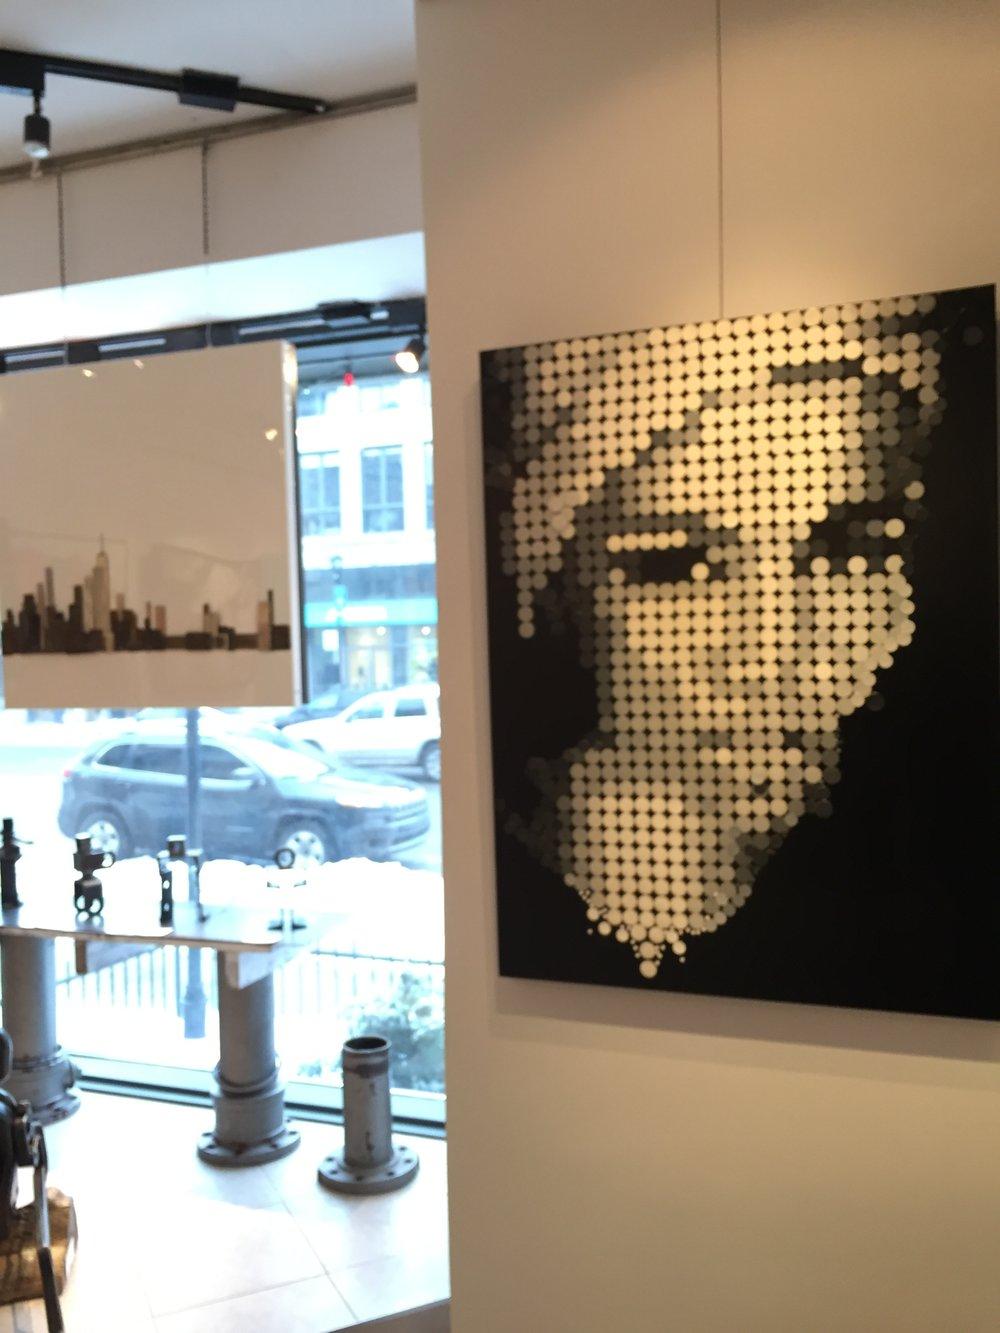 Osana - Artiste : Sylvie DagenaisDimensions : 40 x 30 in.Médium :Mixte médias